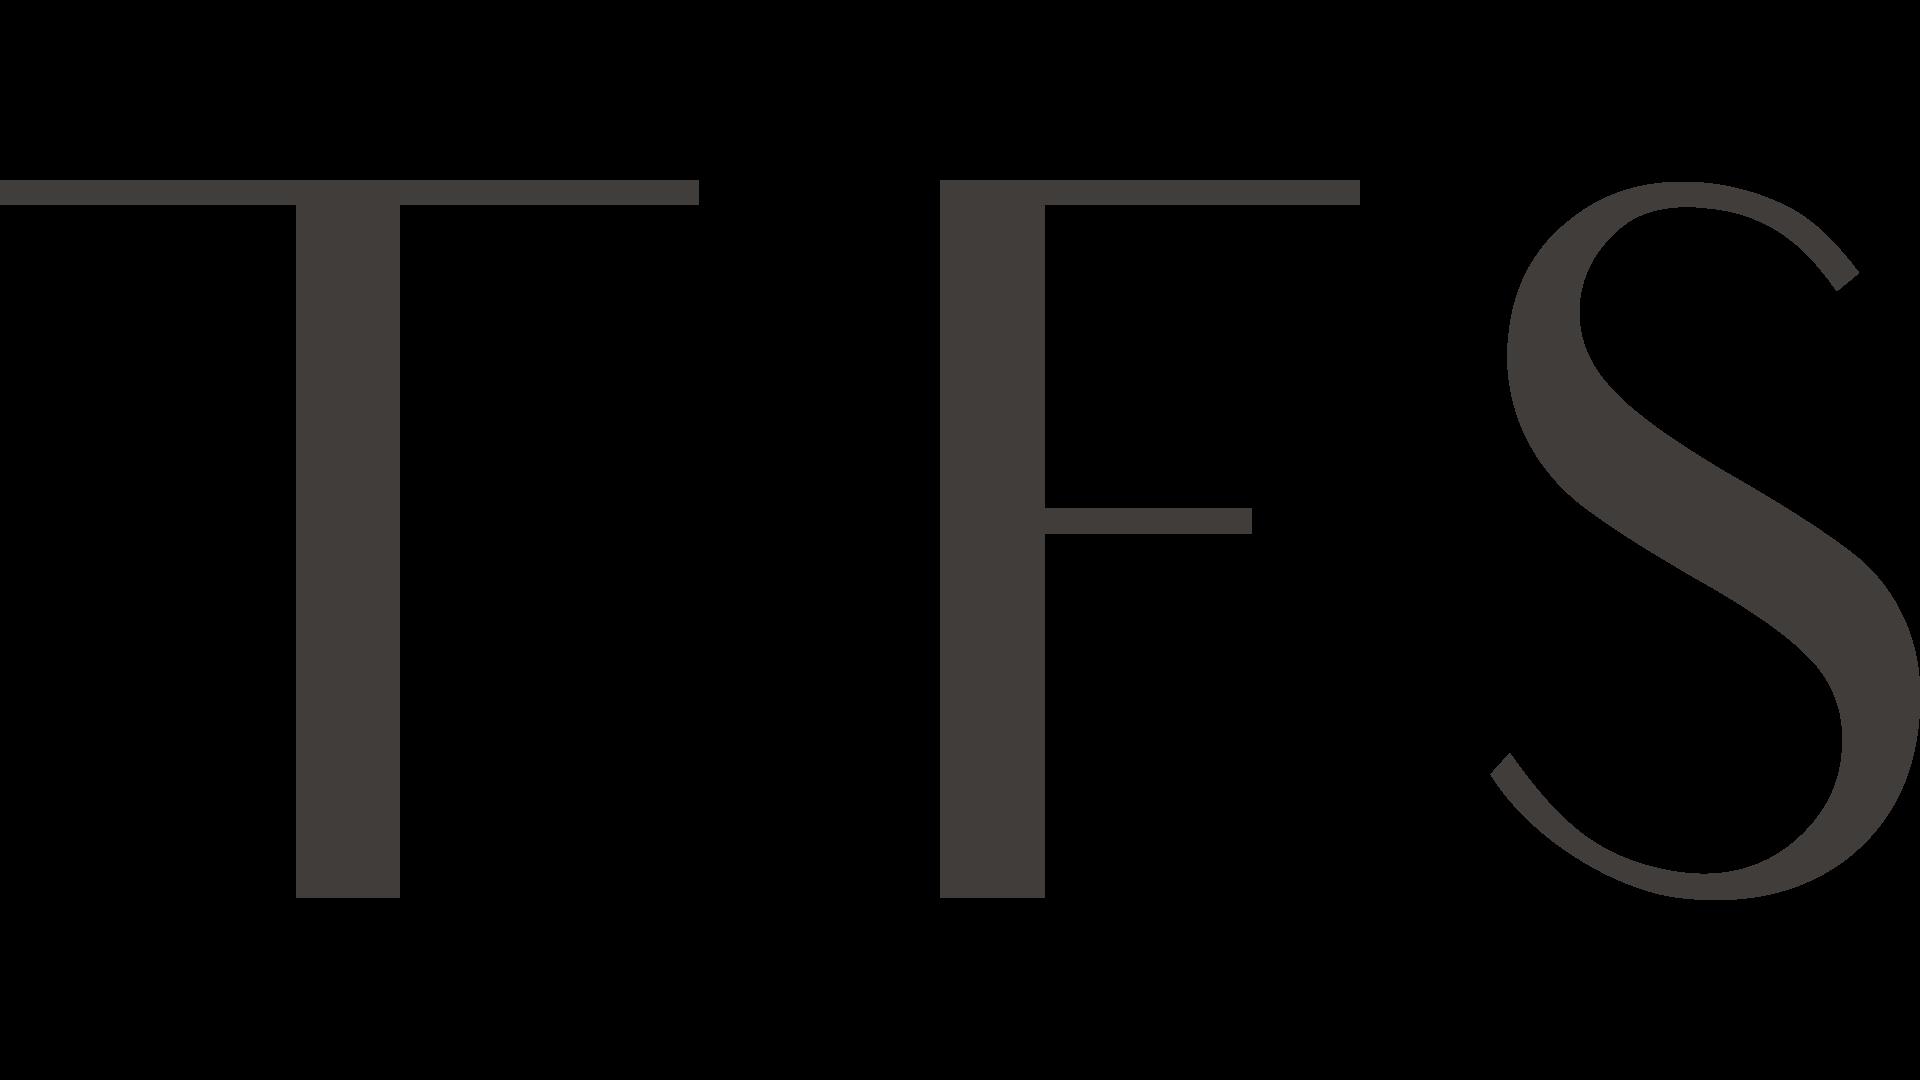 tdc signage brand